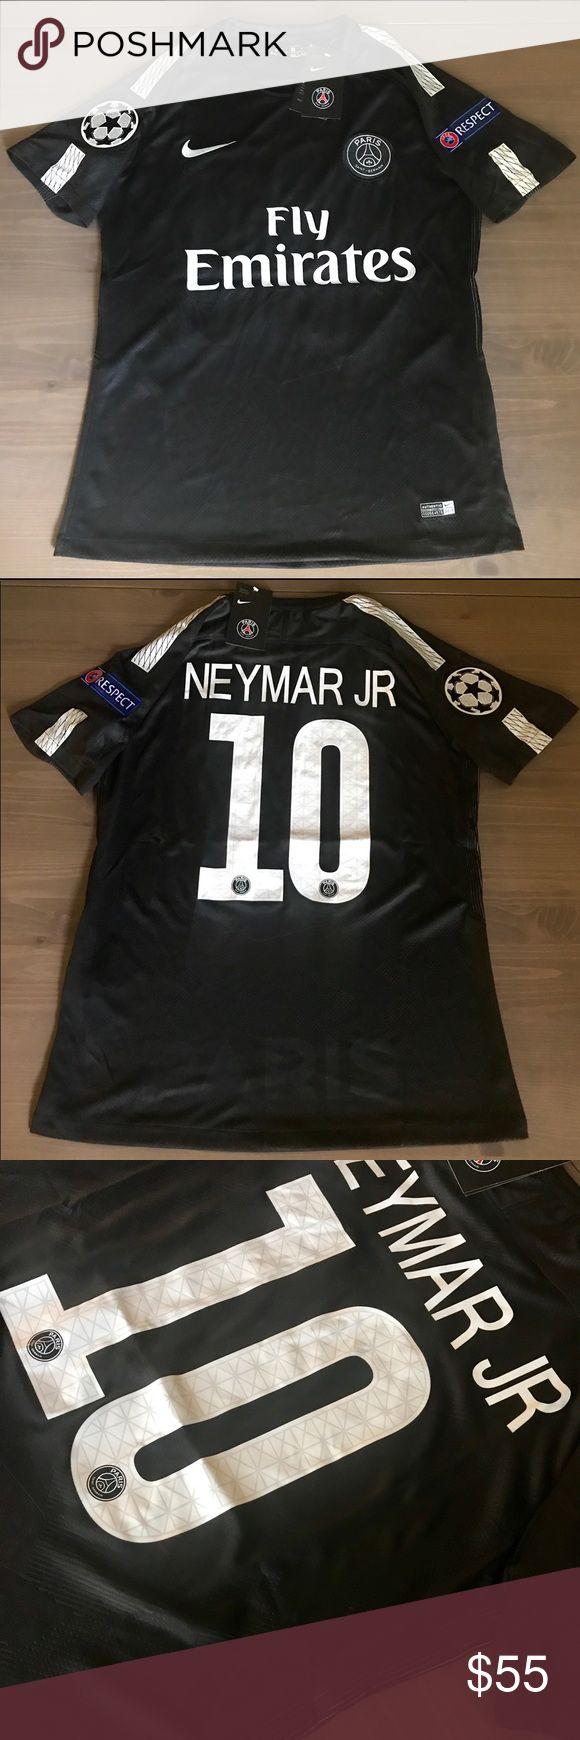 PSG Neymar Jr. #10 soccer jersey champions league PSG away black Neymar Jr. #10 soccer jersey champions league 17/18 Nike Shirts Tees - Short Sleeve